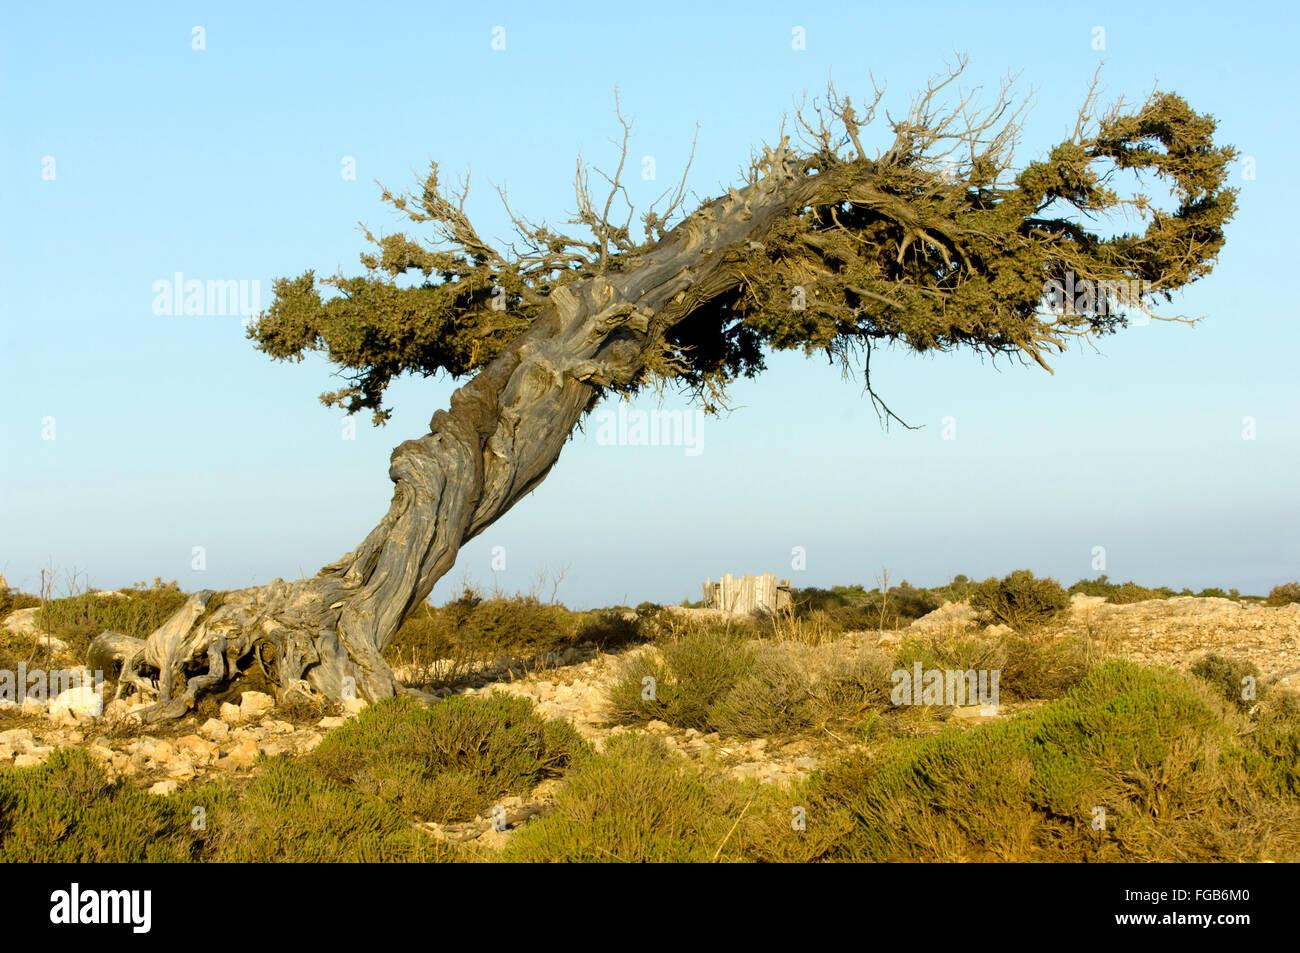 Griechenland, Kreta, Insel Gavdos, Landschaft und Vegetation - Stock Image